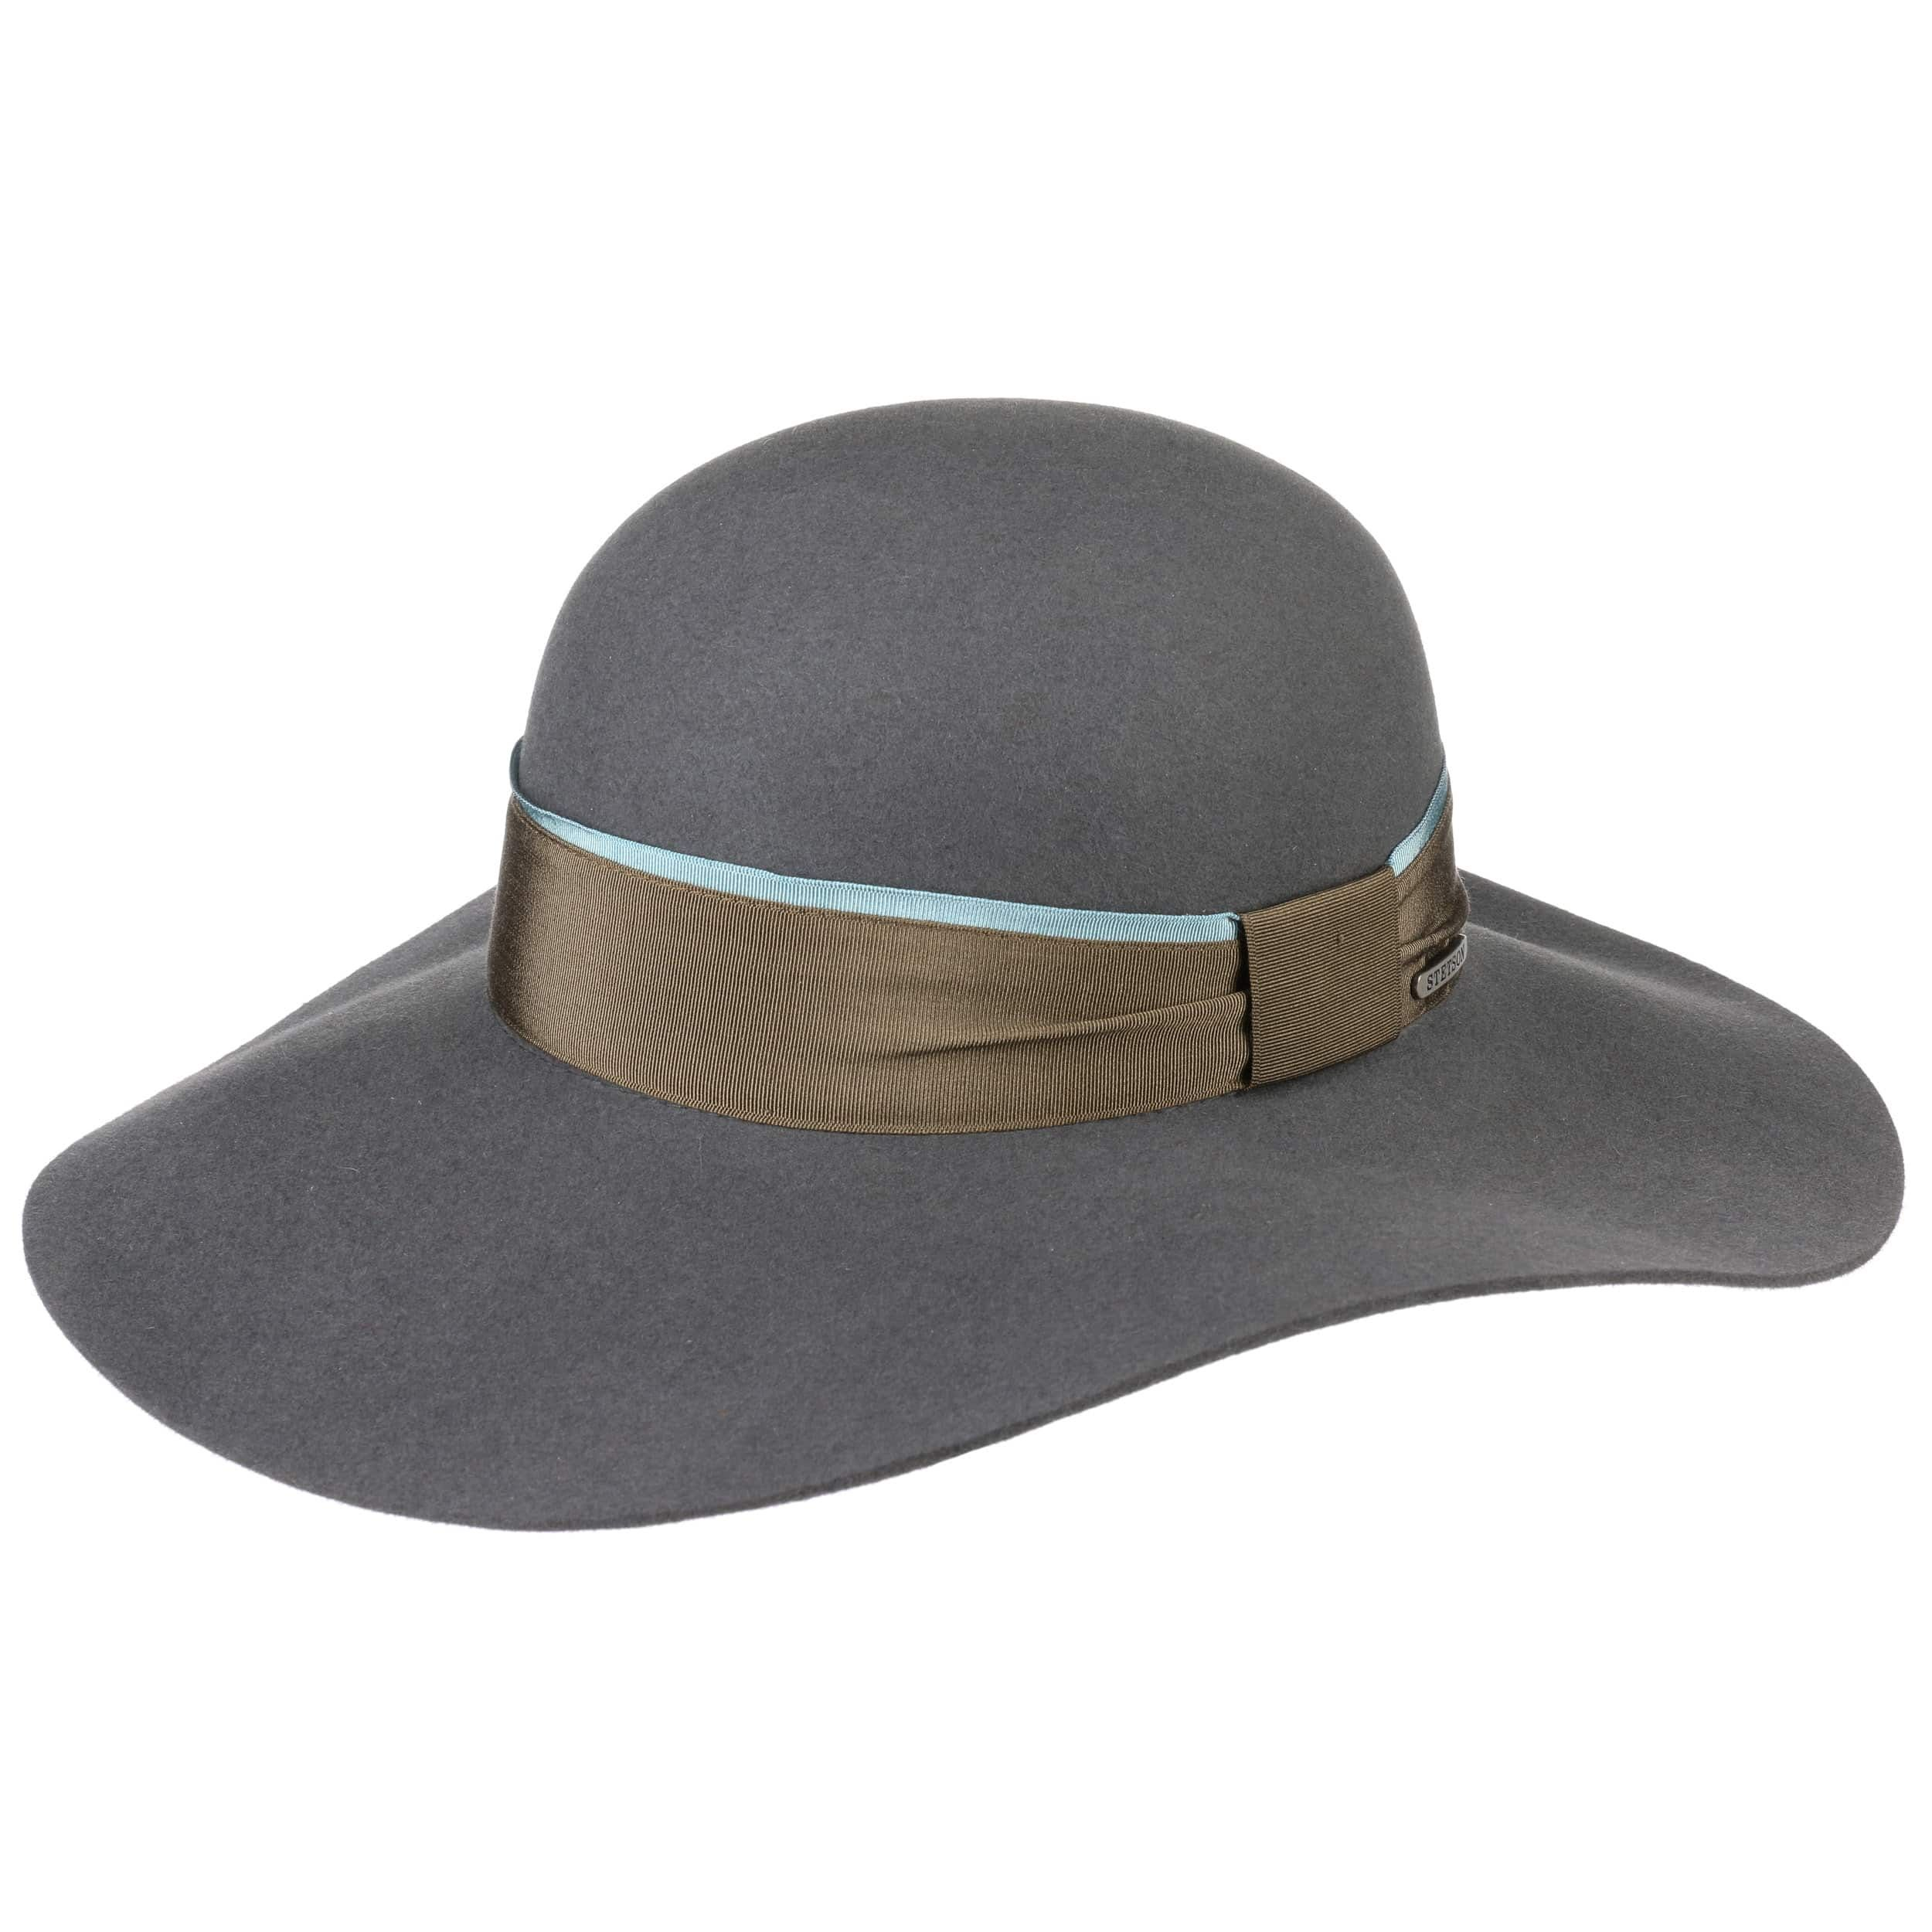 Elegantina Fur Felt Floppy Hat grey